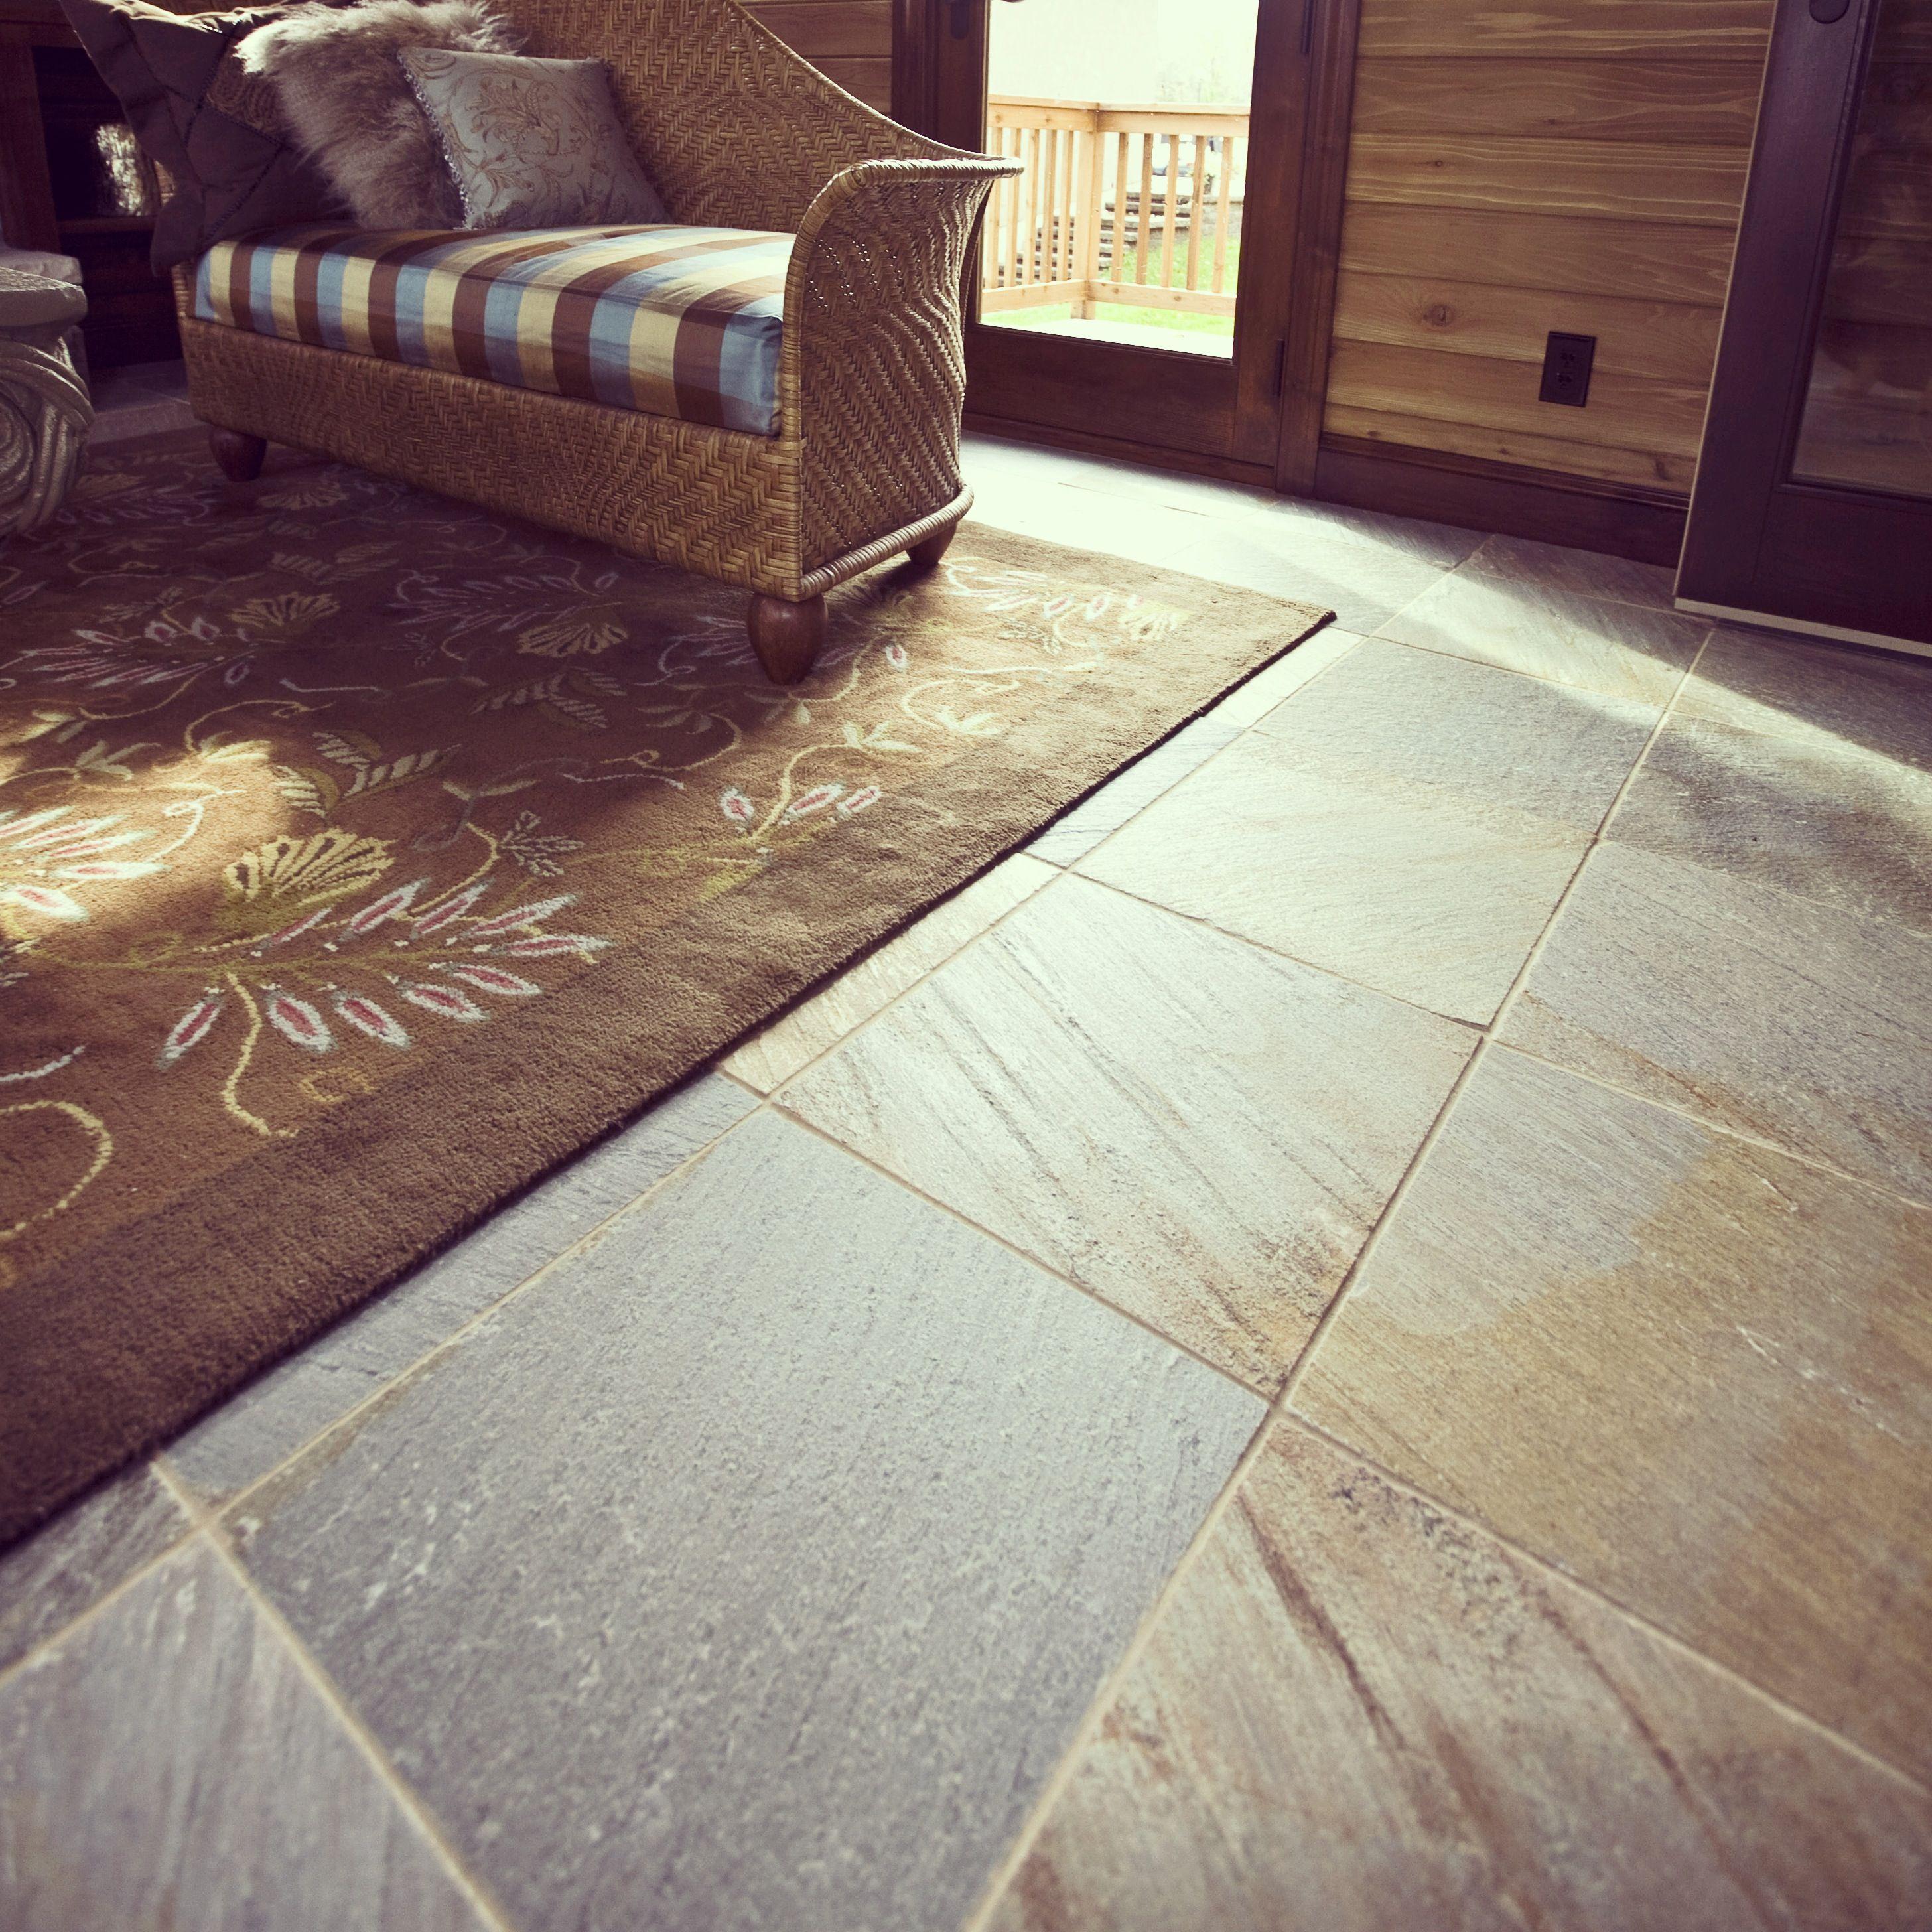 Baoding creme quartzite tile in a sun room pinthedream pin the baoding creme quartzite tile in a sun room pinthedream dailygadgetfo Choice Image